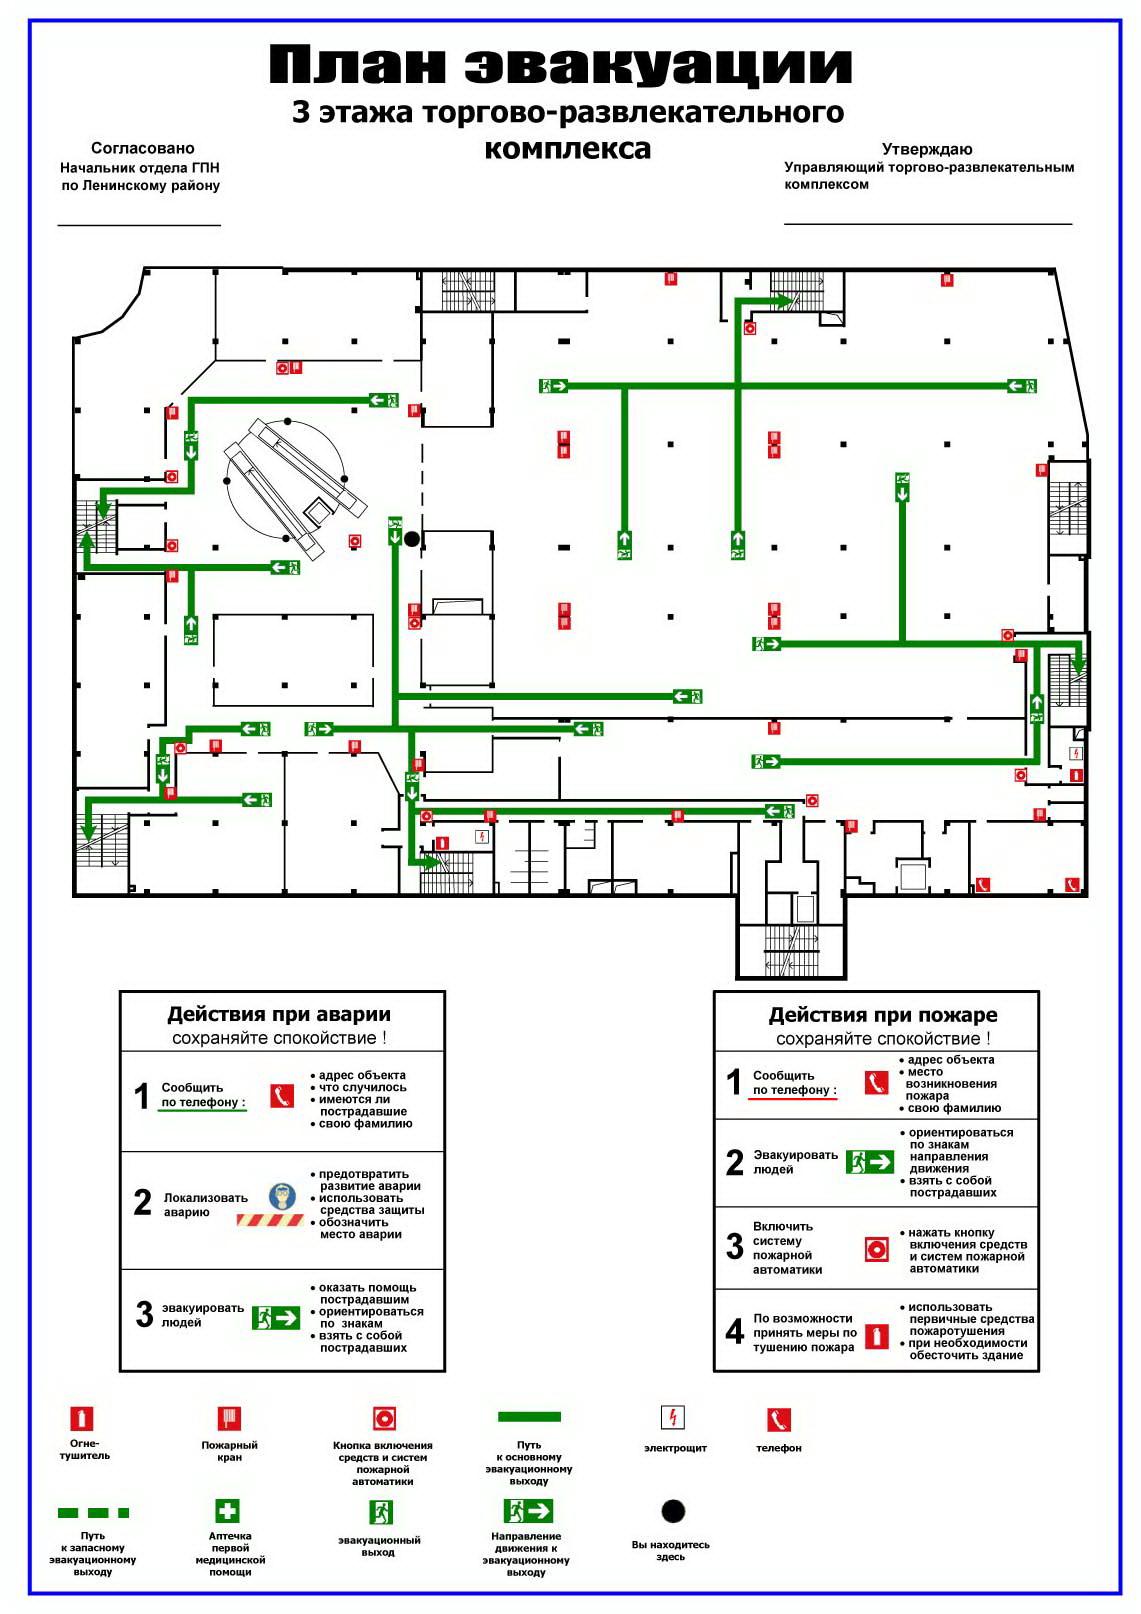 Программа для чертежа схем эвакуации